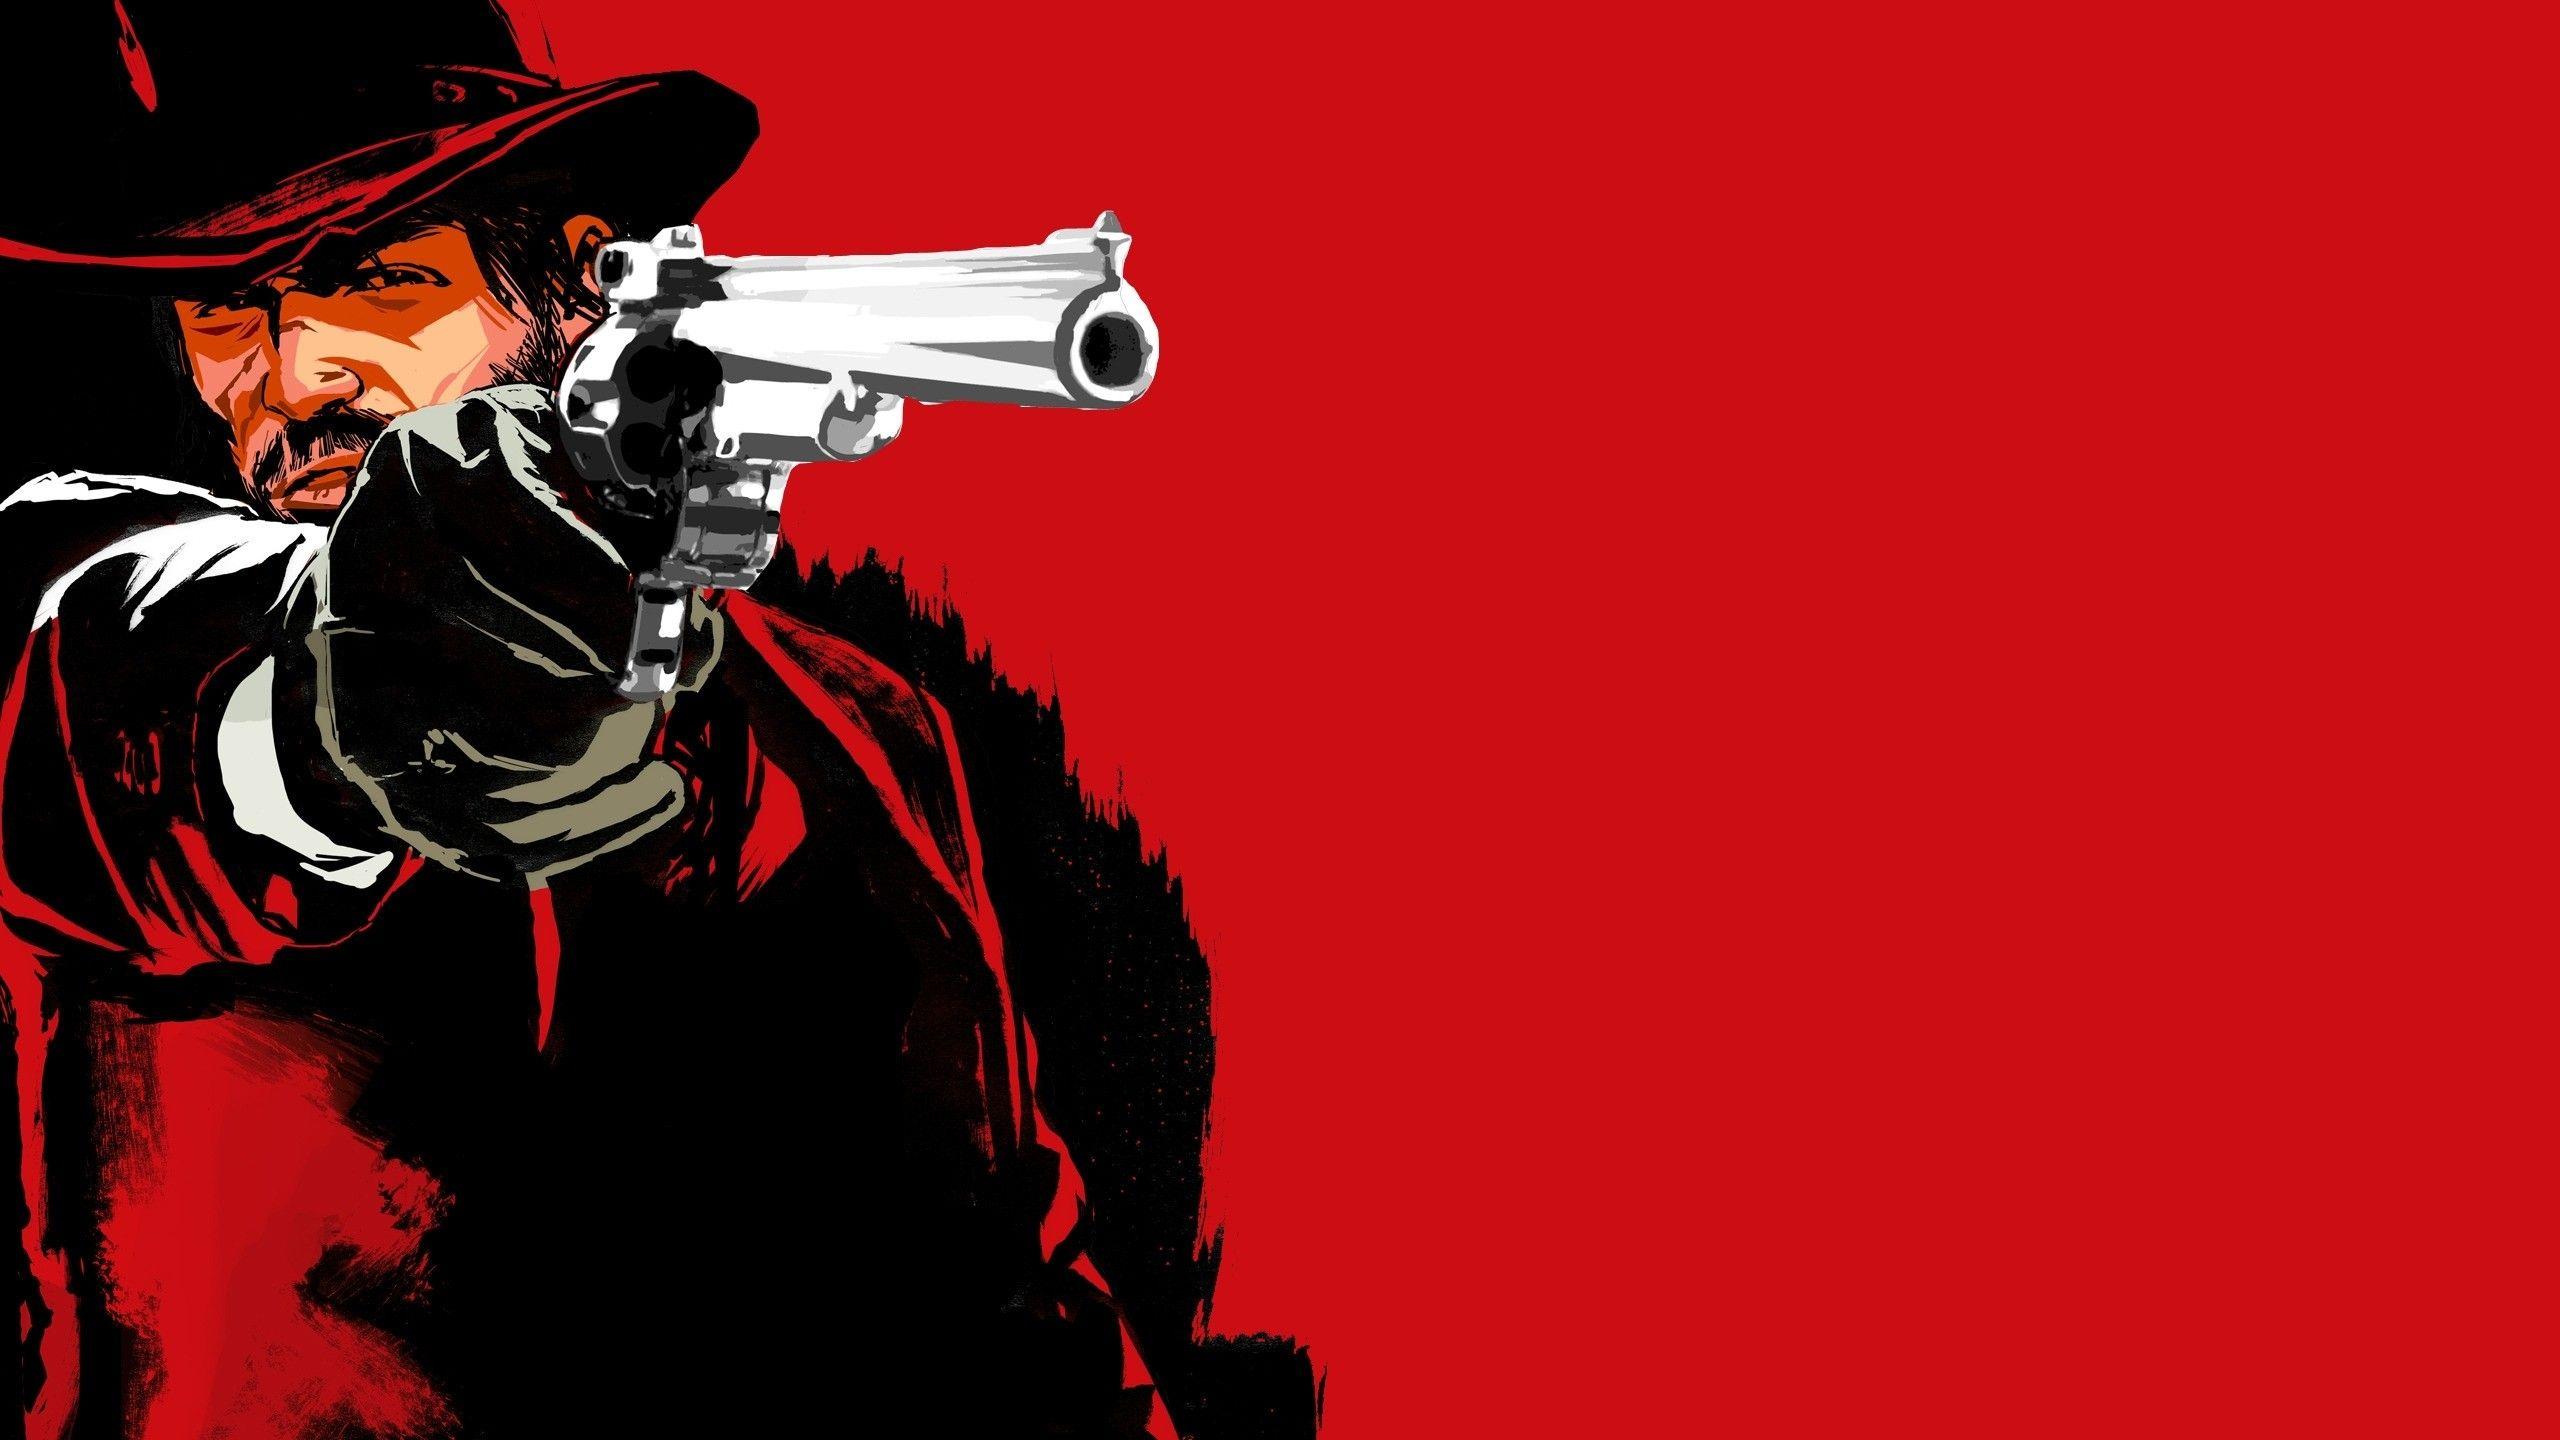 2560x1440 2560x1440 Wallpaper red dead redemption game